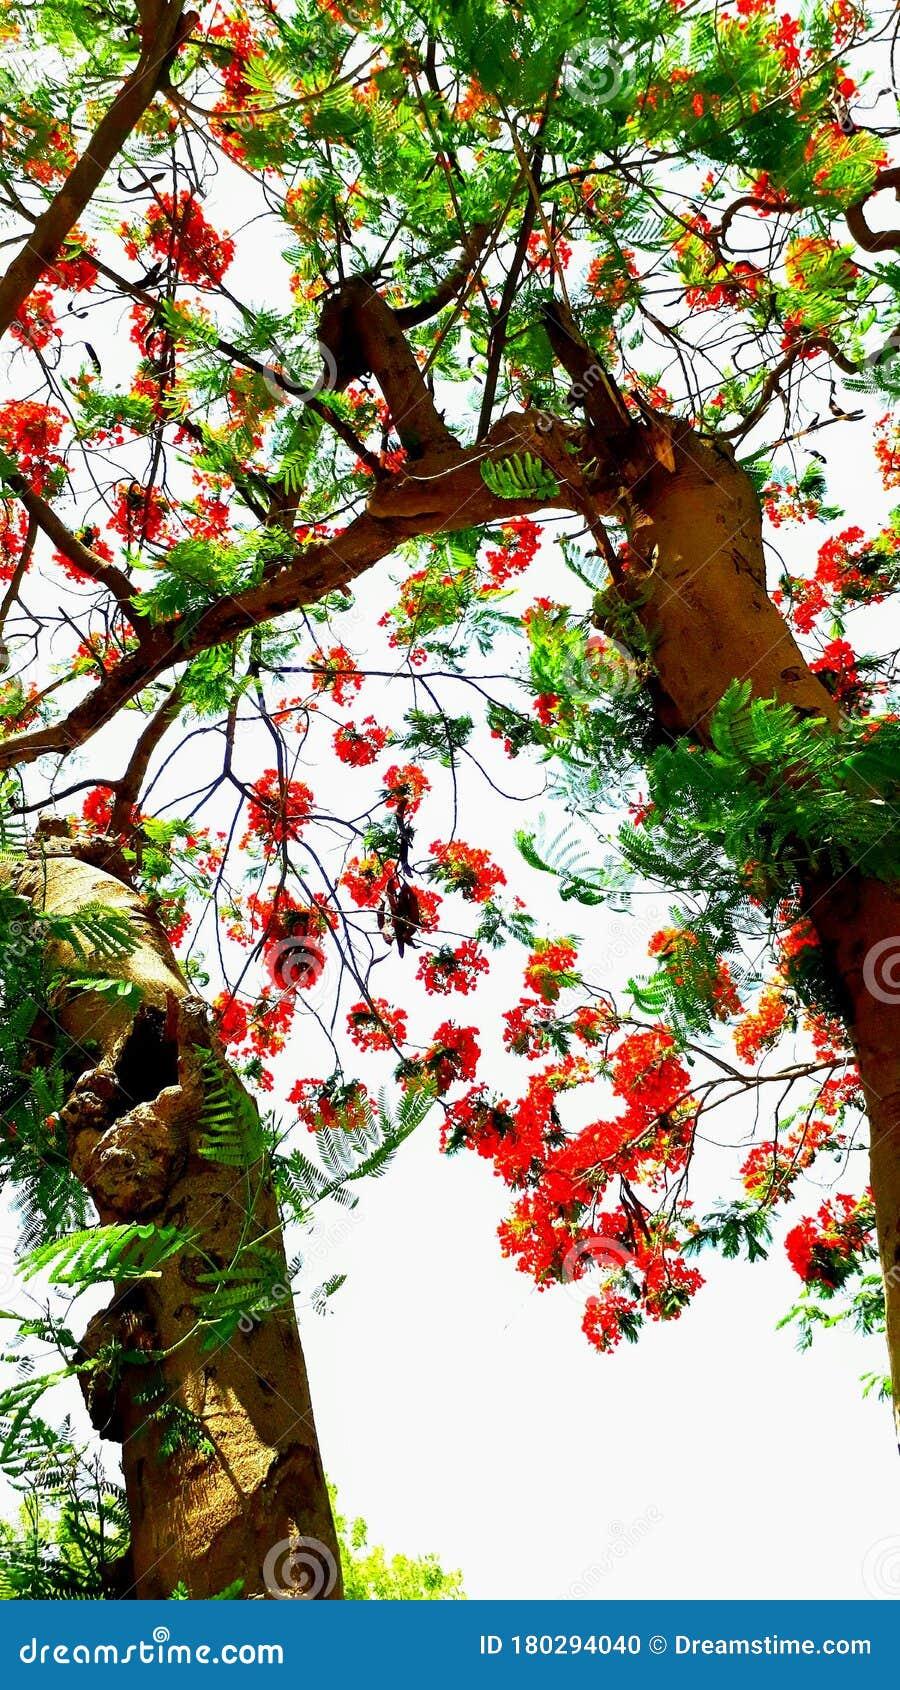 Beautiful Flower Tree Hd Wallpaper For Mobile Stock Photo Image Of Beautifulflowerhdwallpaper Beautifulflowerimages 180294040